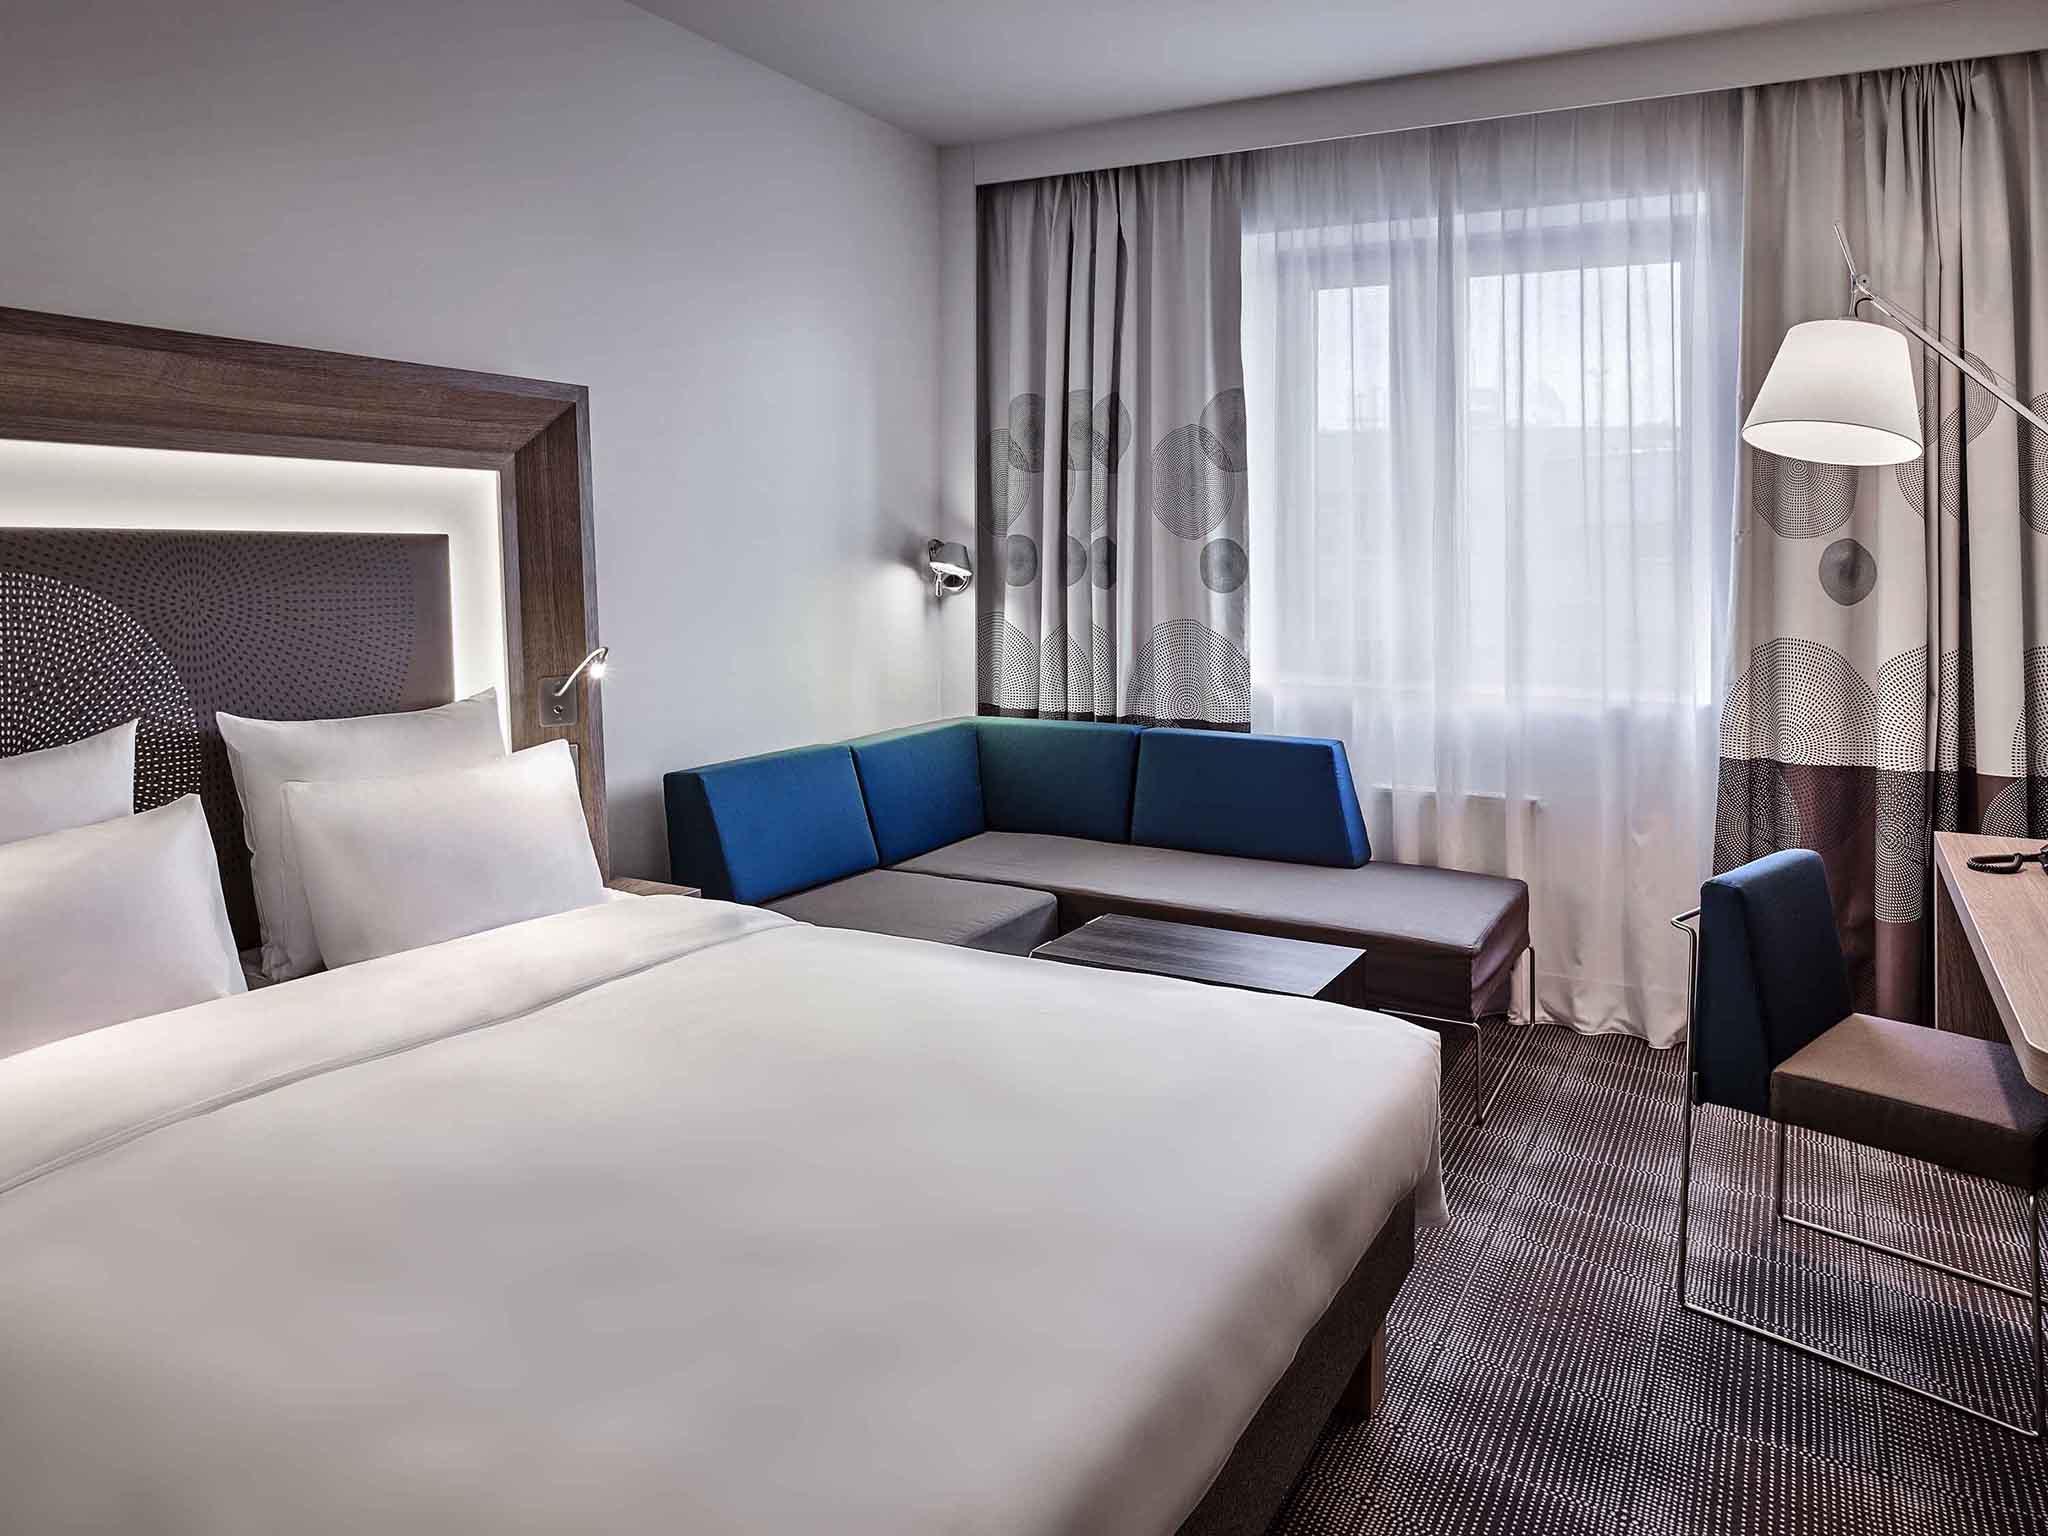 هتل نووتل مسکو کیوسکالا